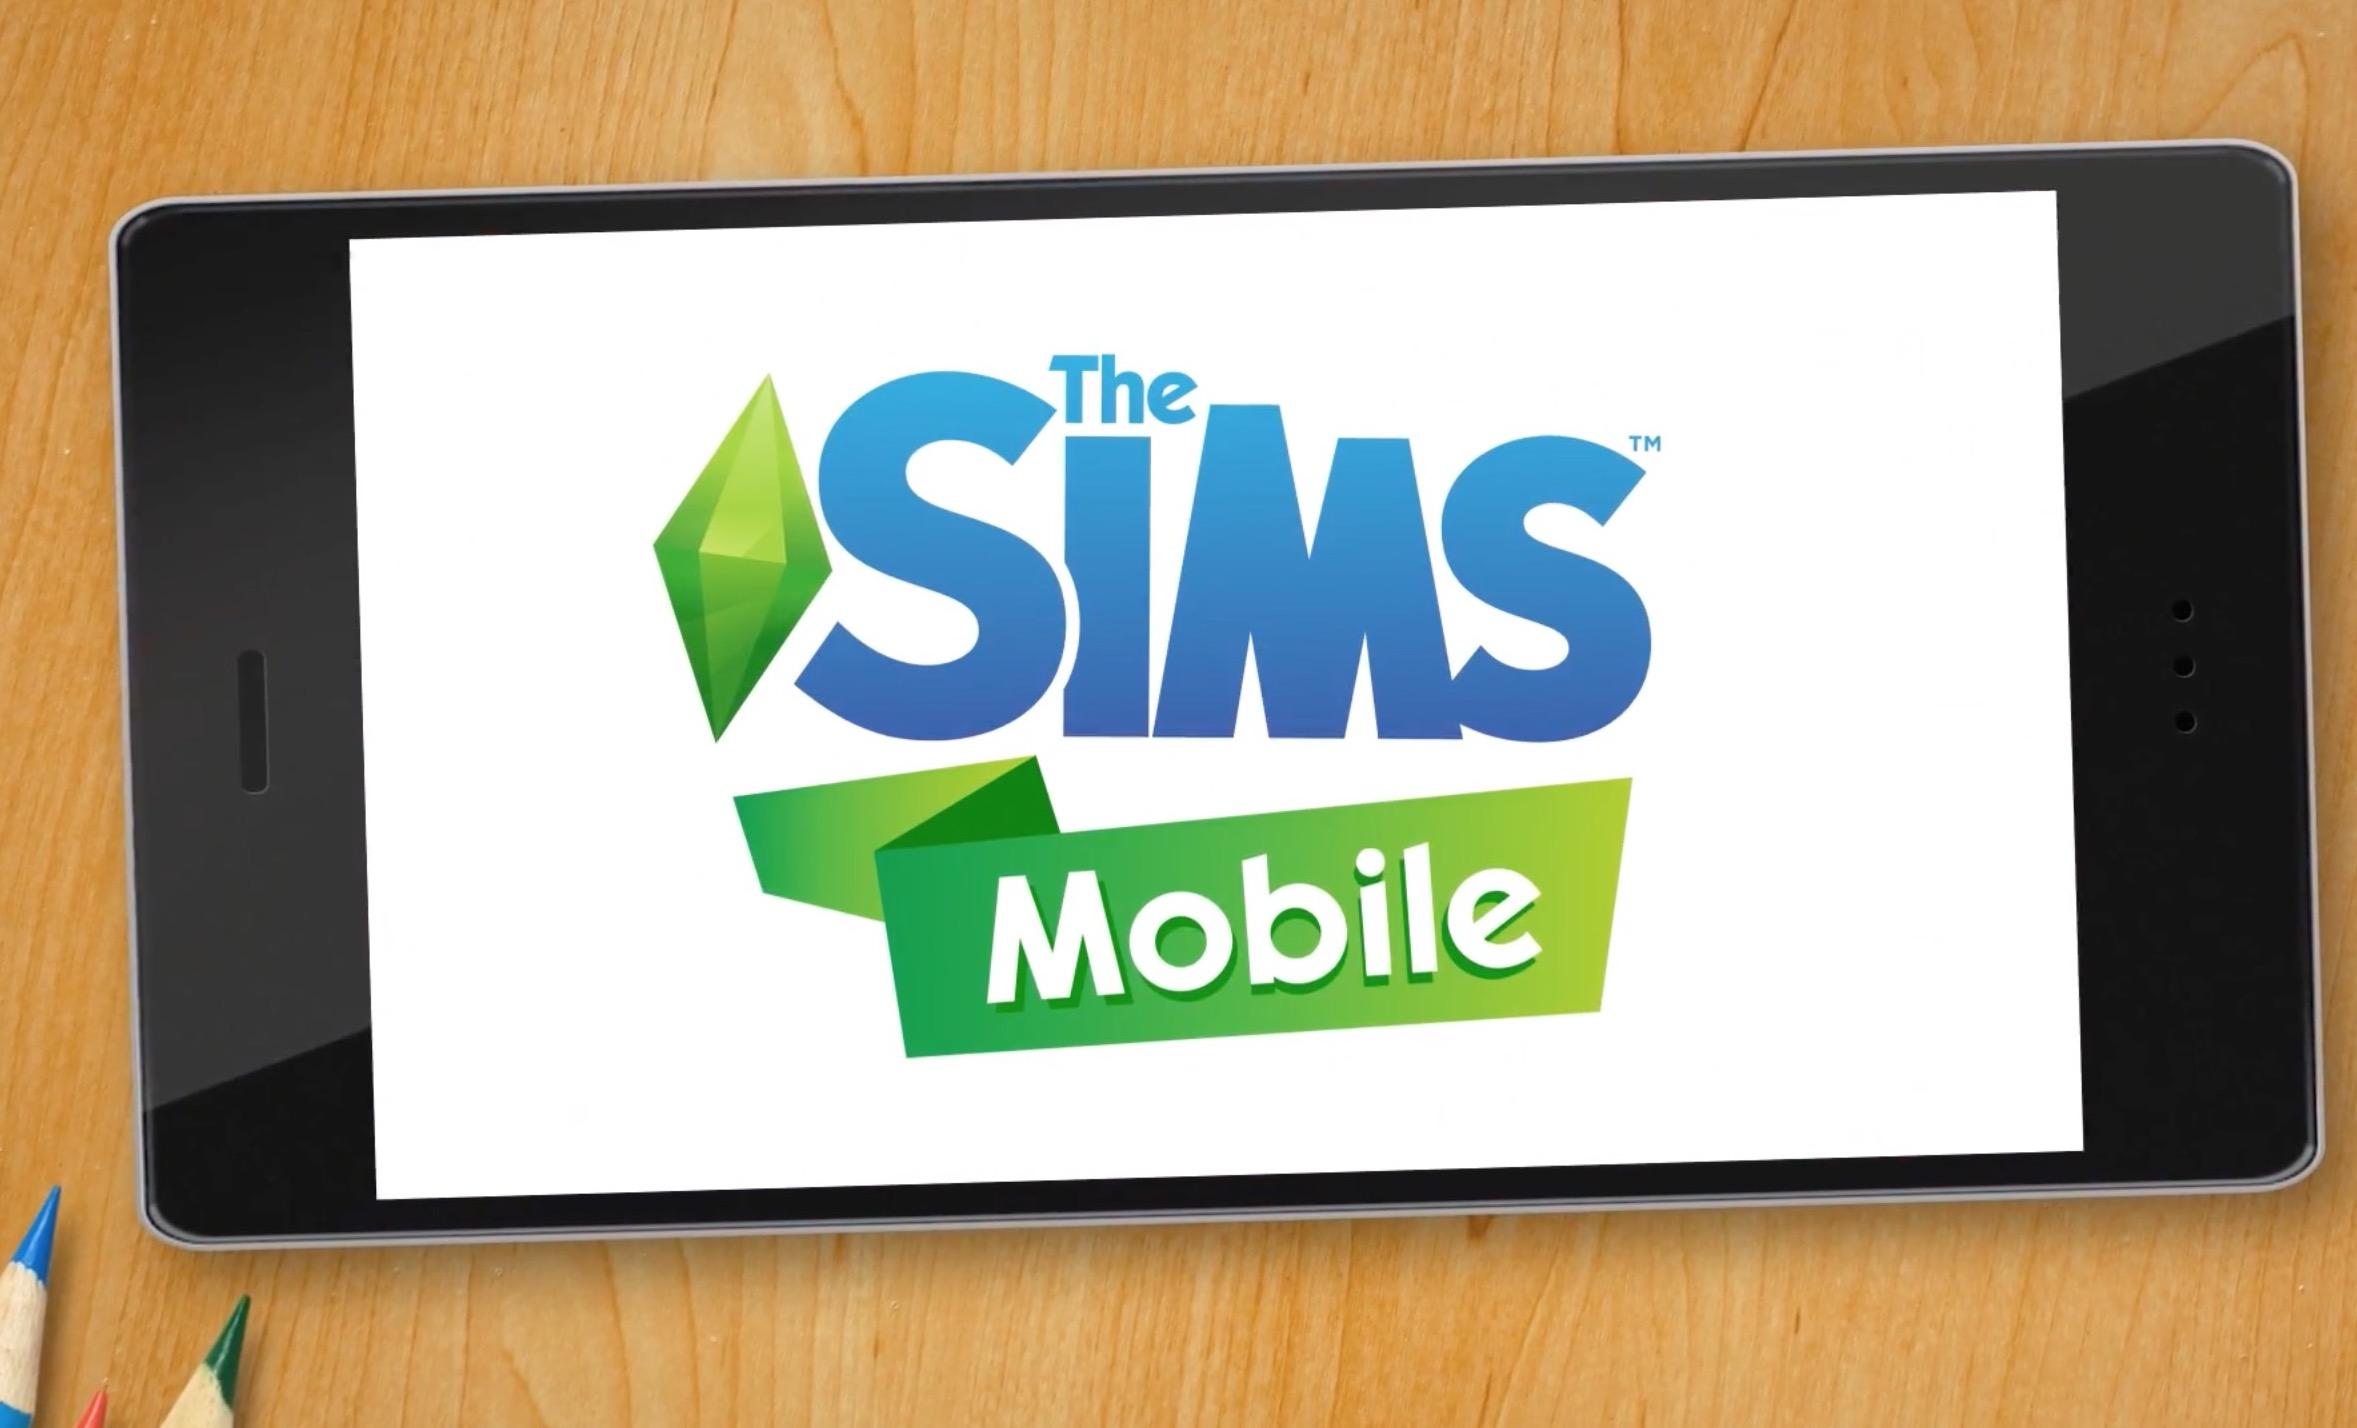 EA annuncia The Sims Mobile per iOS e Android